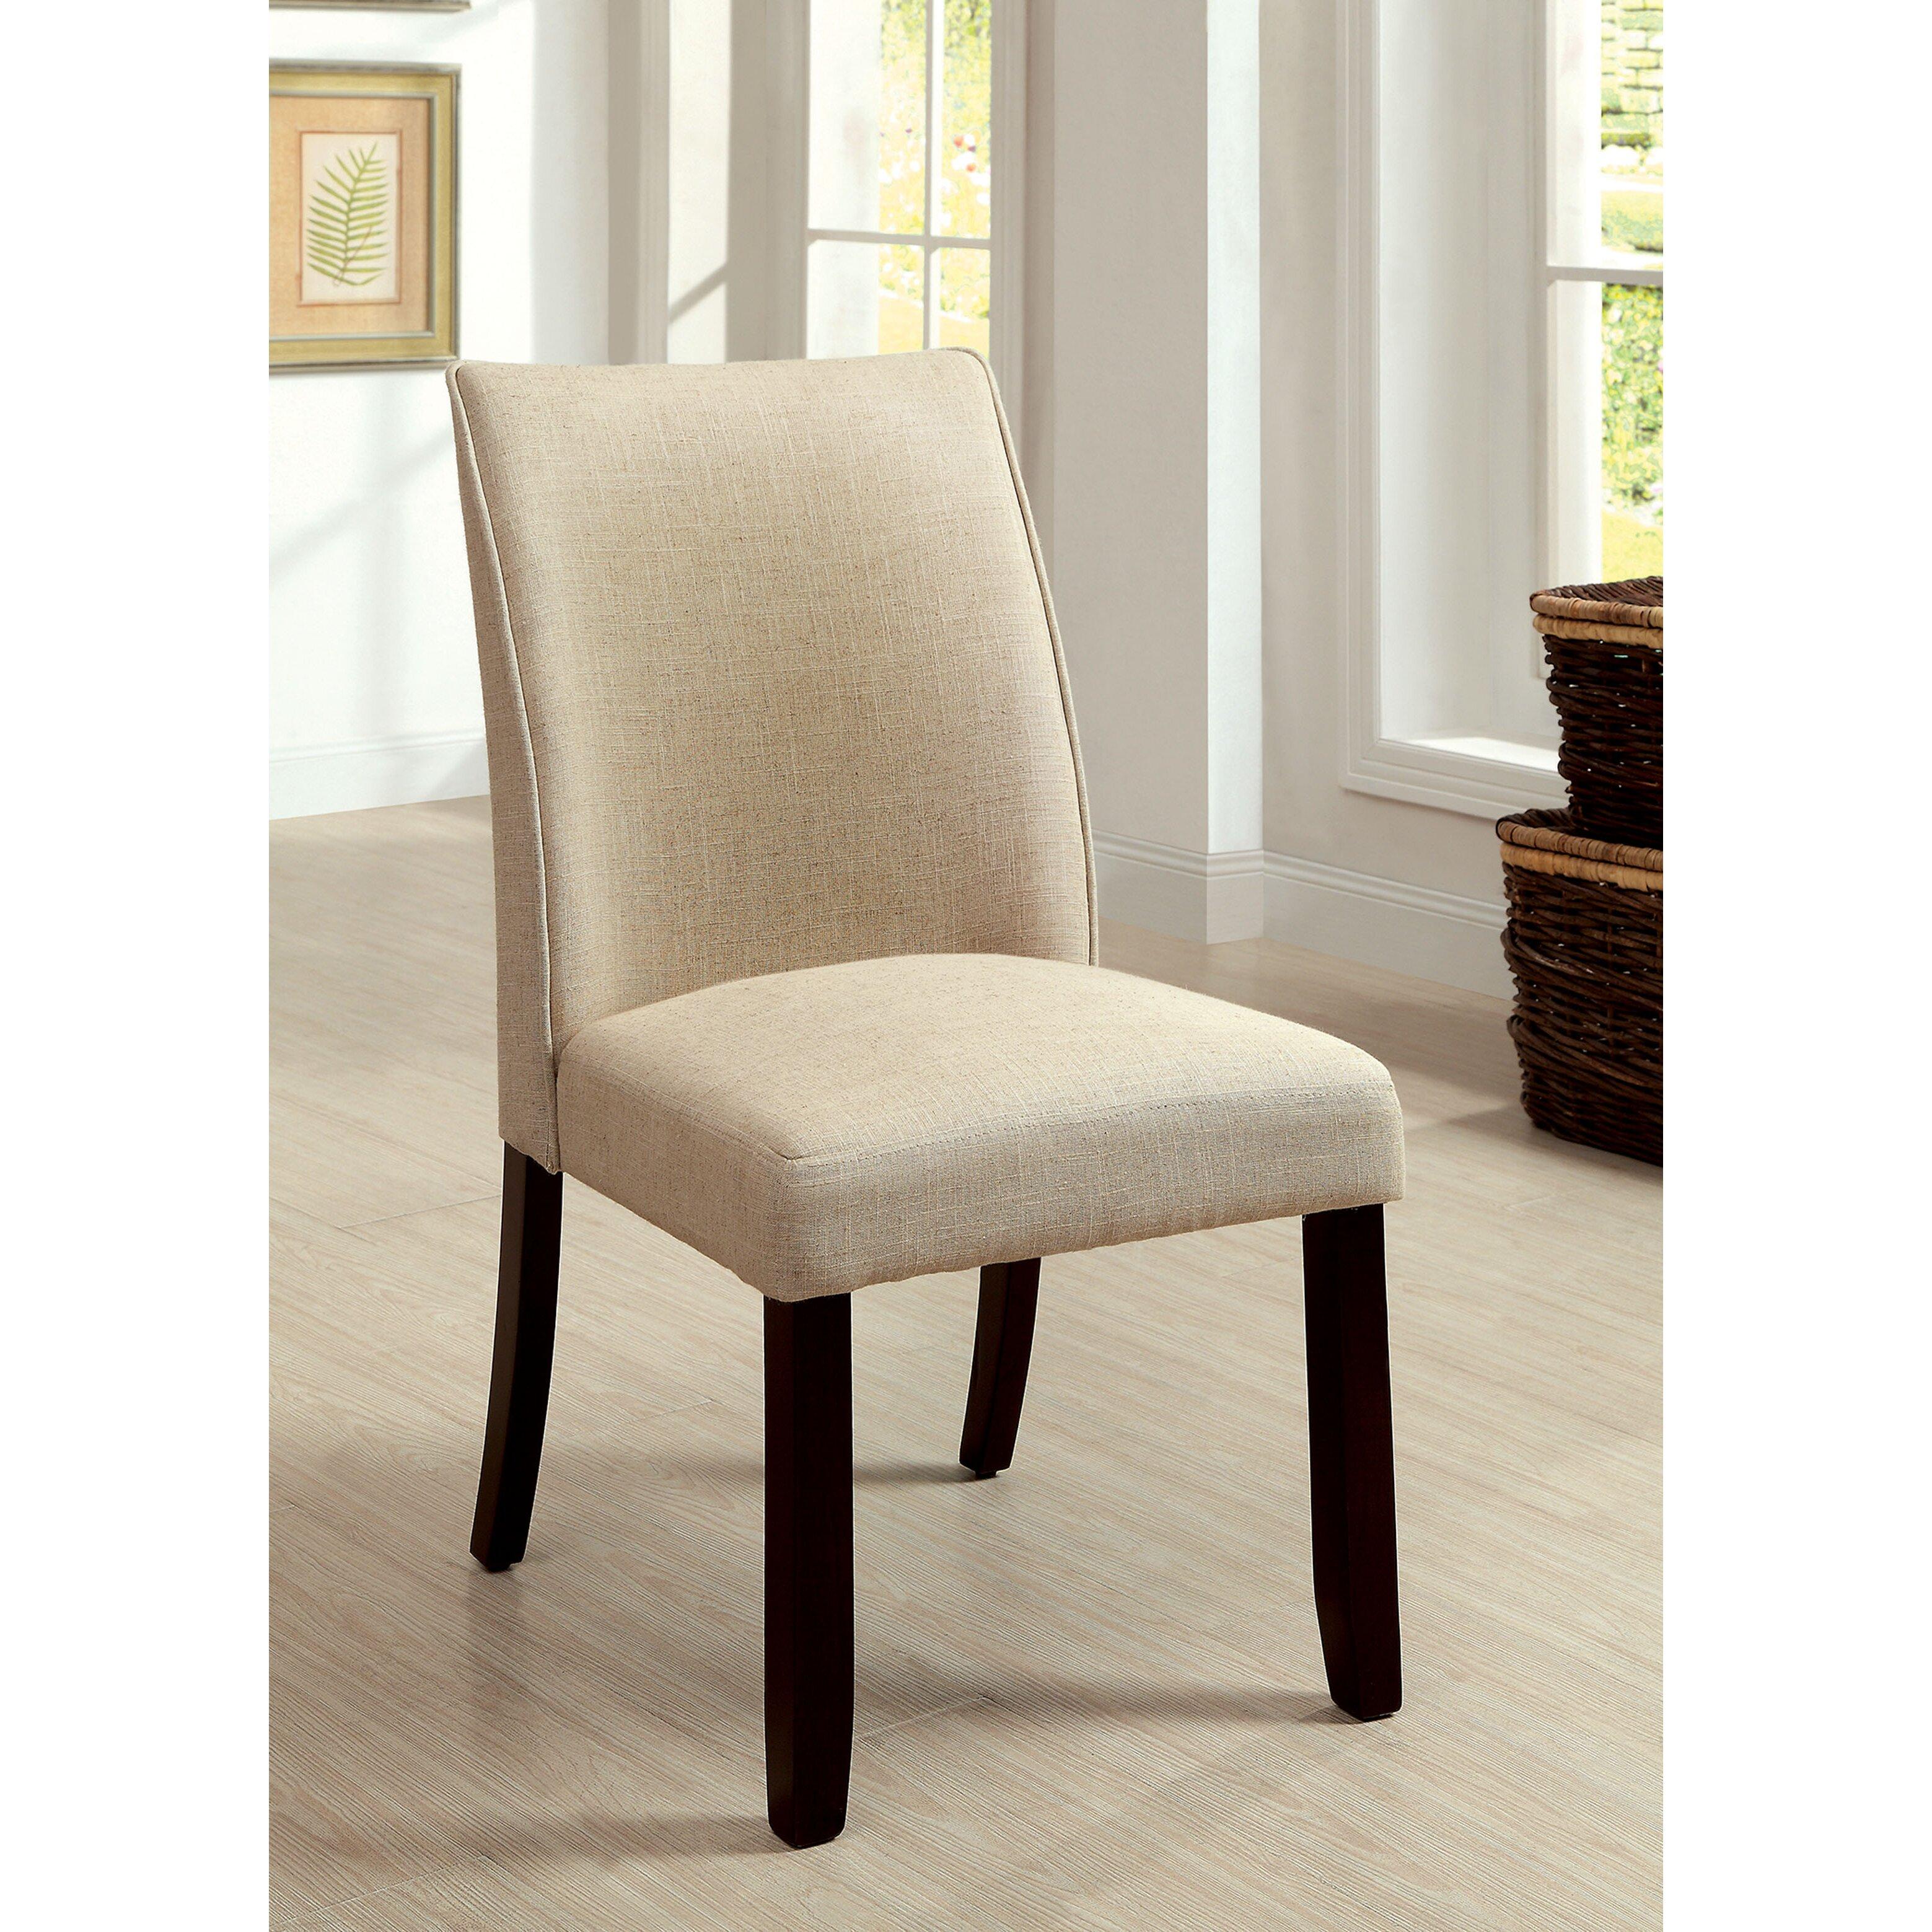 Hokku Designs Hokku Designs Vessice Side Chair Reviews Wayfair